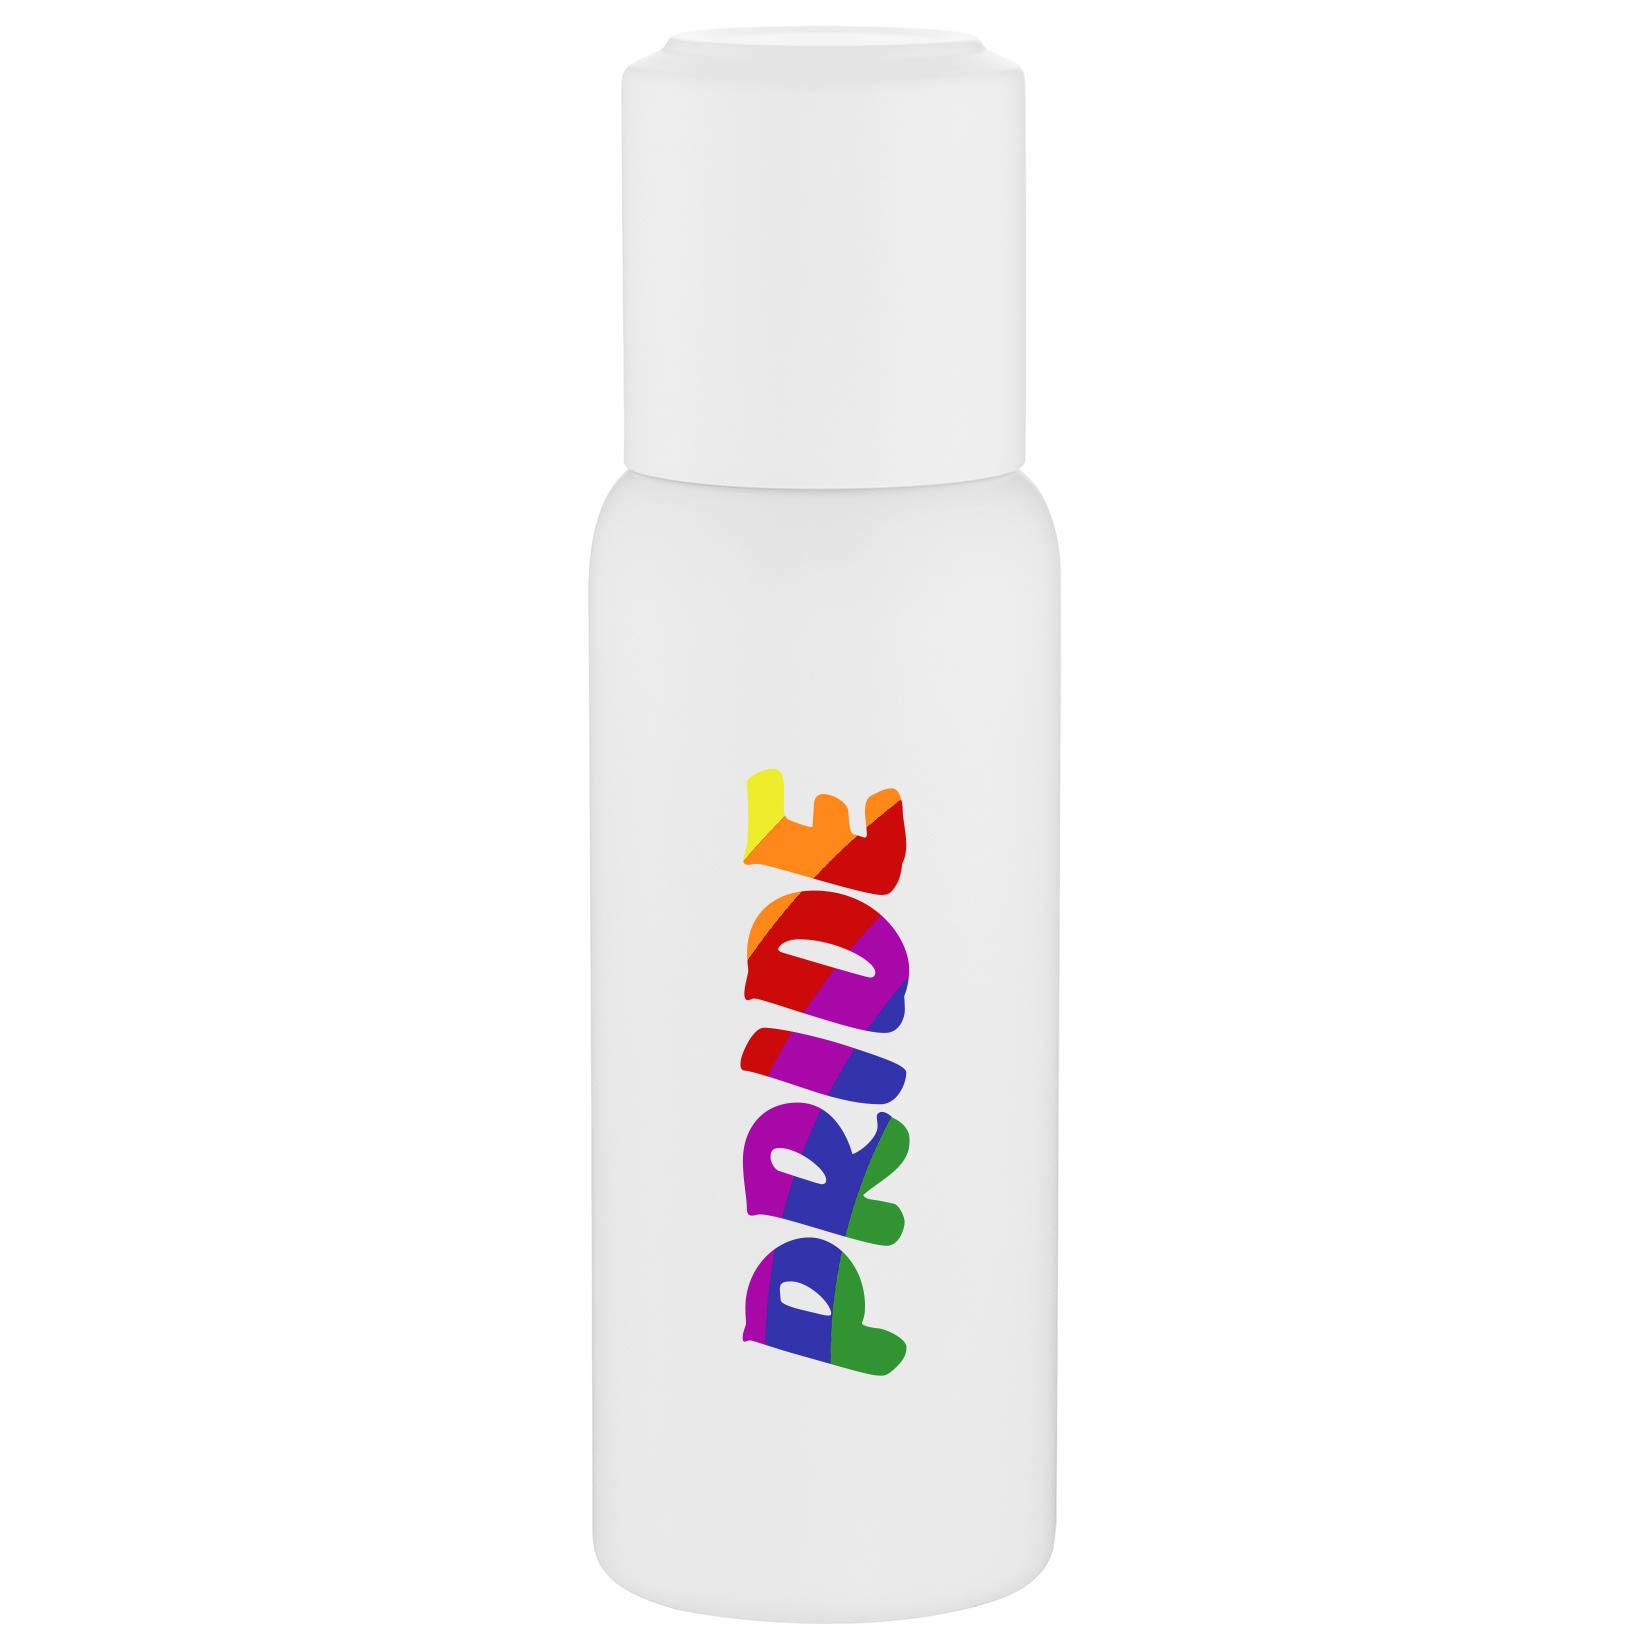 315523 lodge bottle six color imprint on bottle